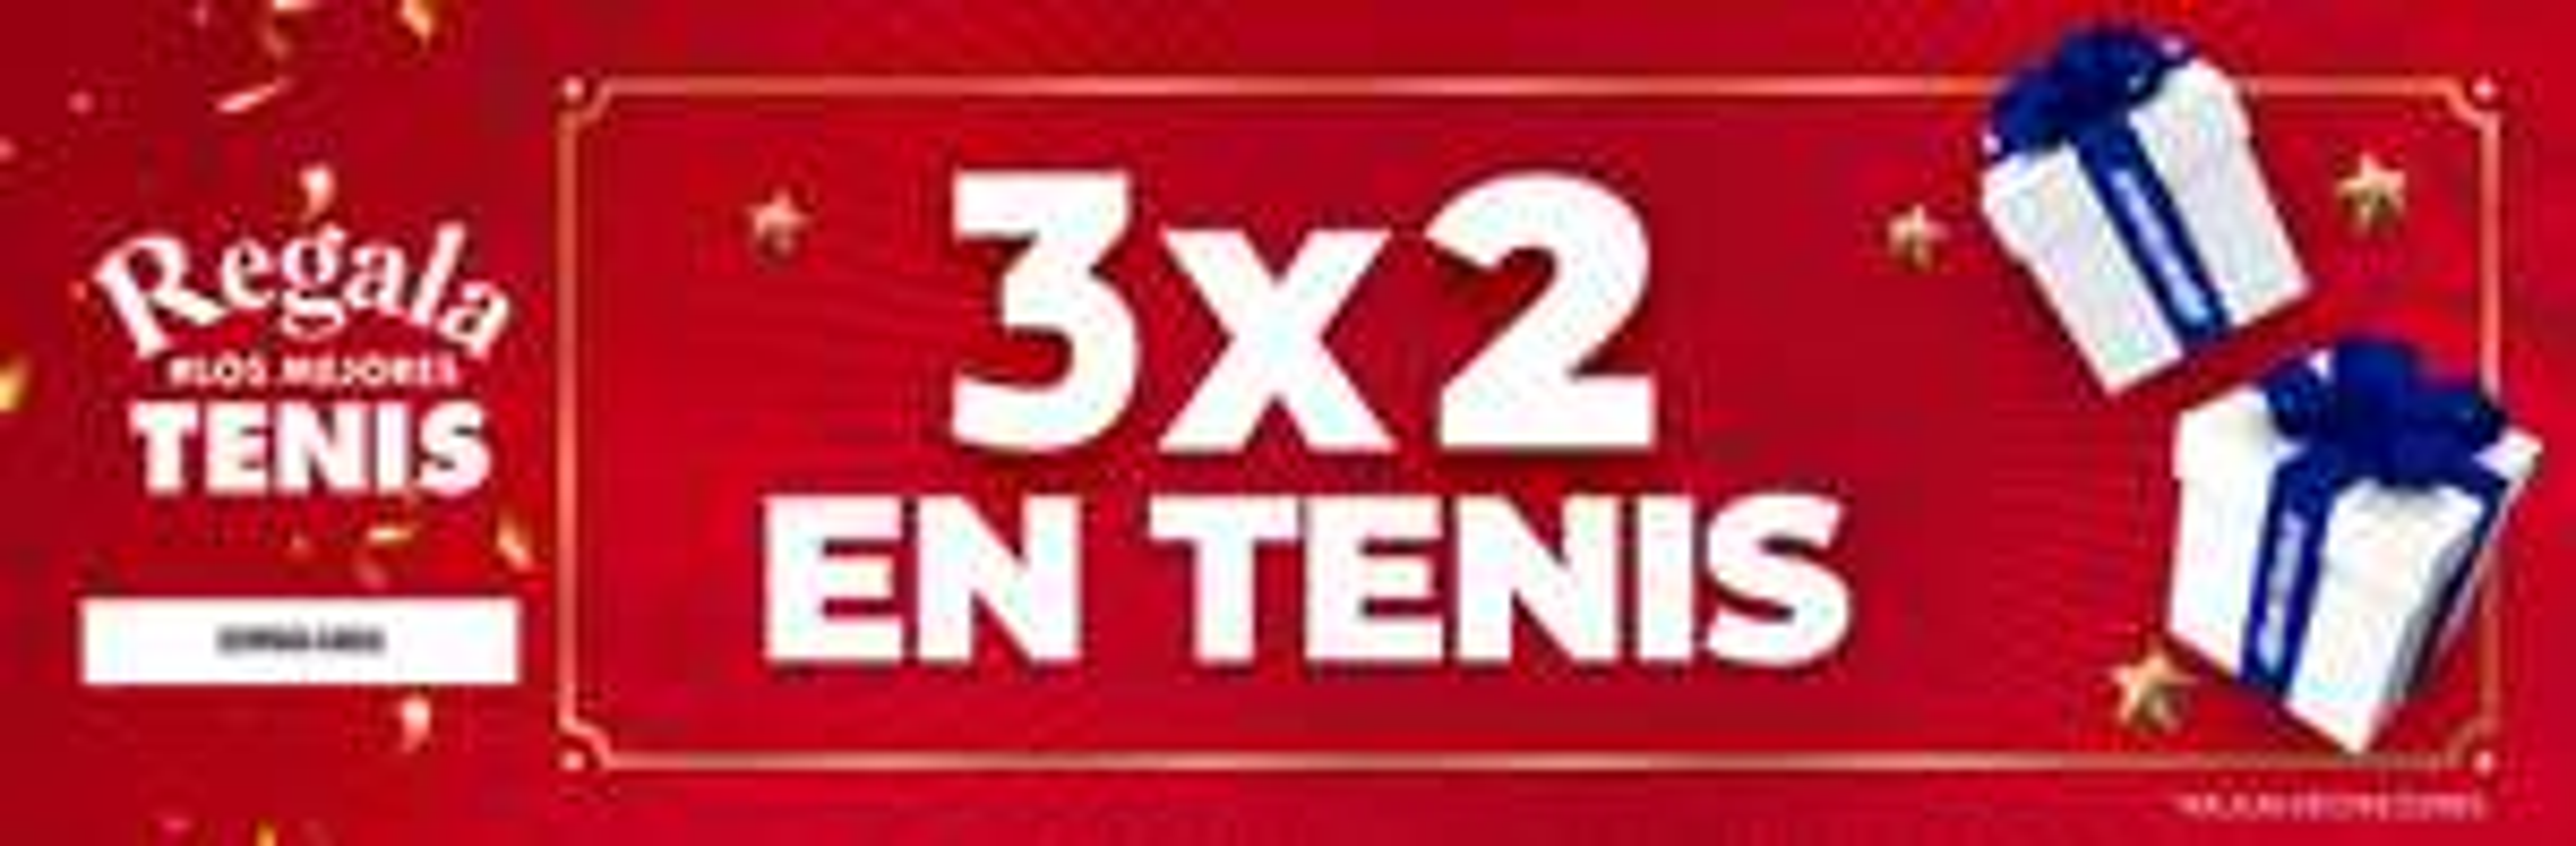 Dportenis : 3x2 tenis (seleccionados) + 40% off (segunda compra) + 3 MSI (Citibanamex, BBVA, Santander) + Rebook (regalo tarjeta $200)